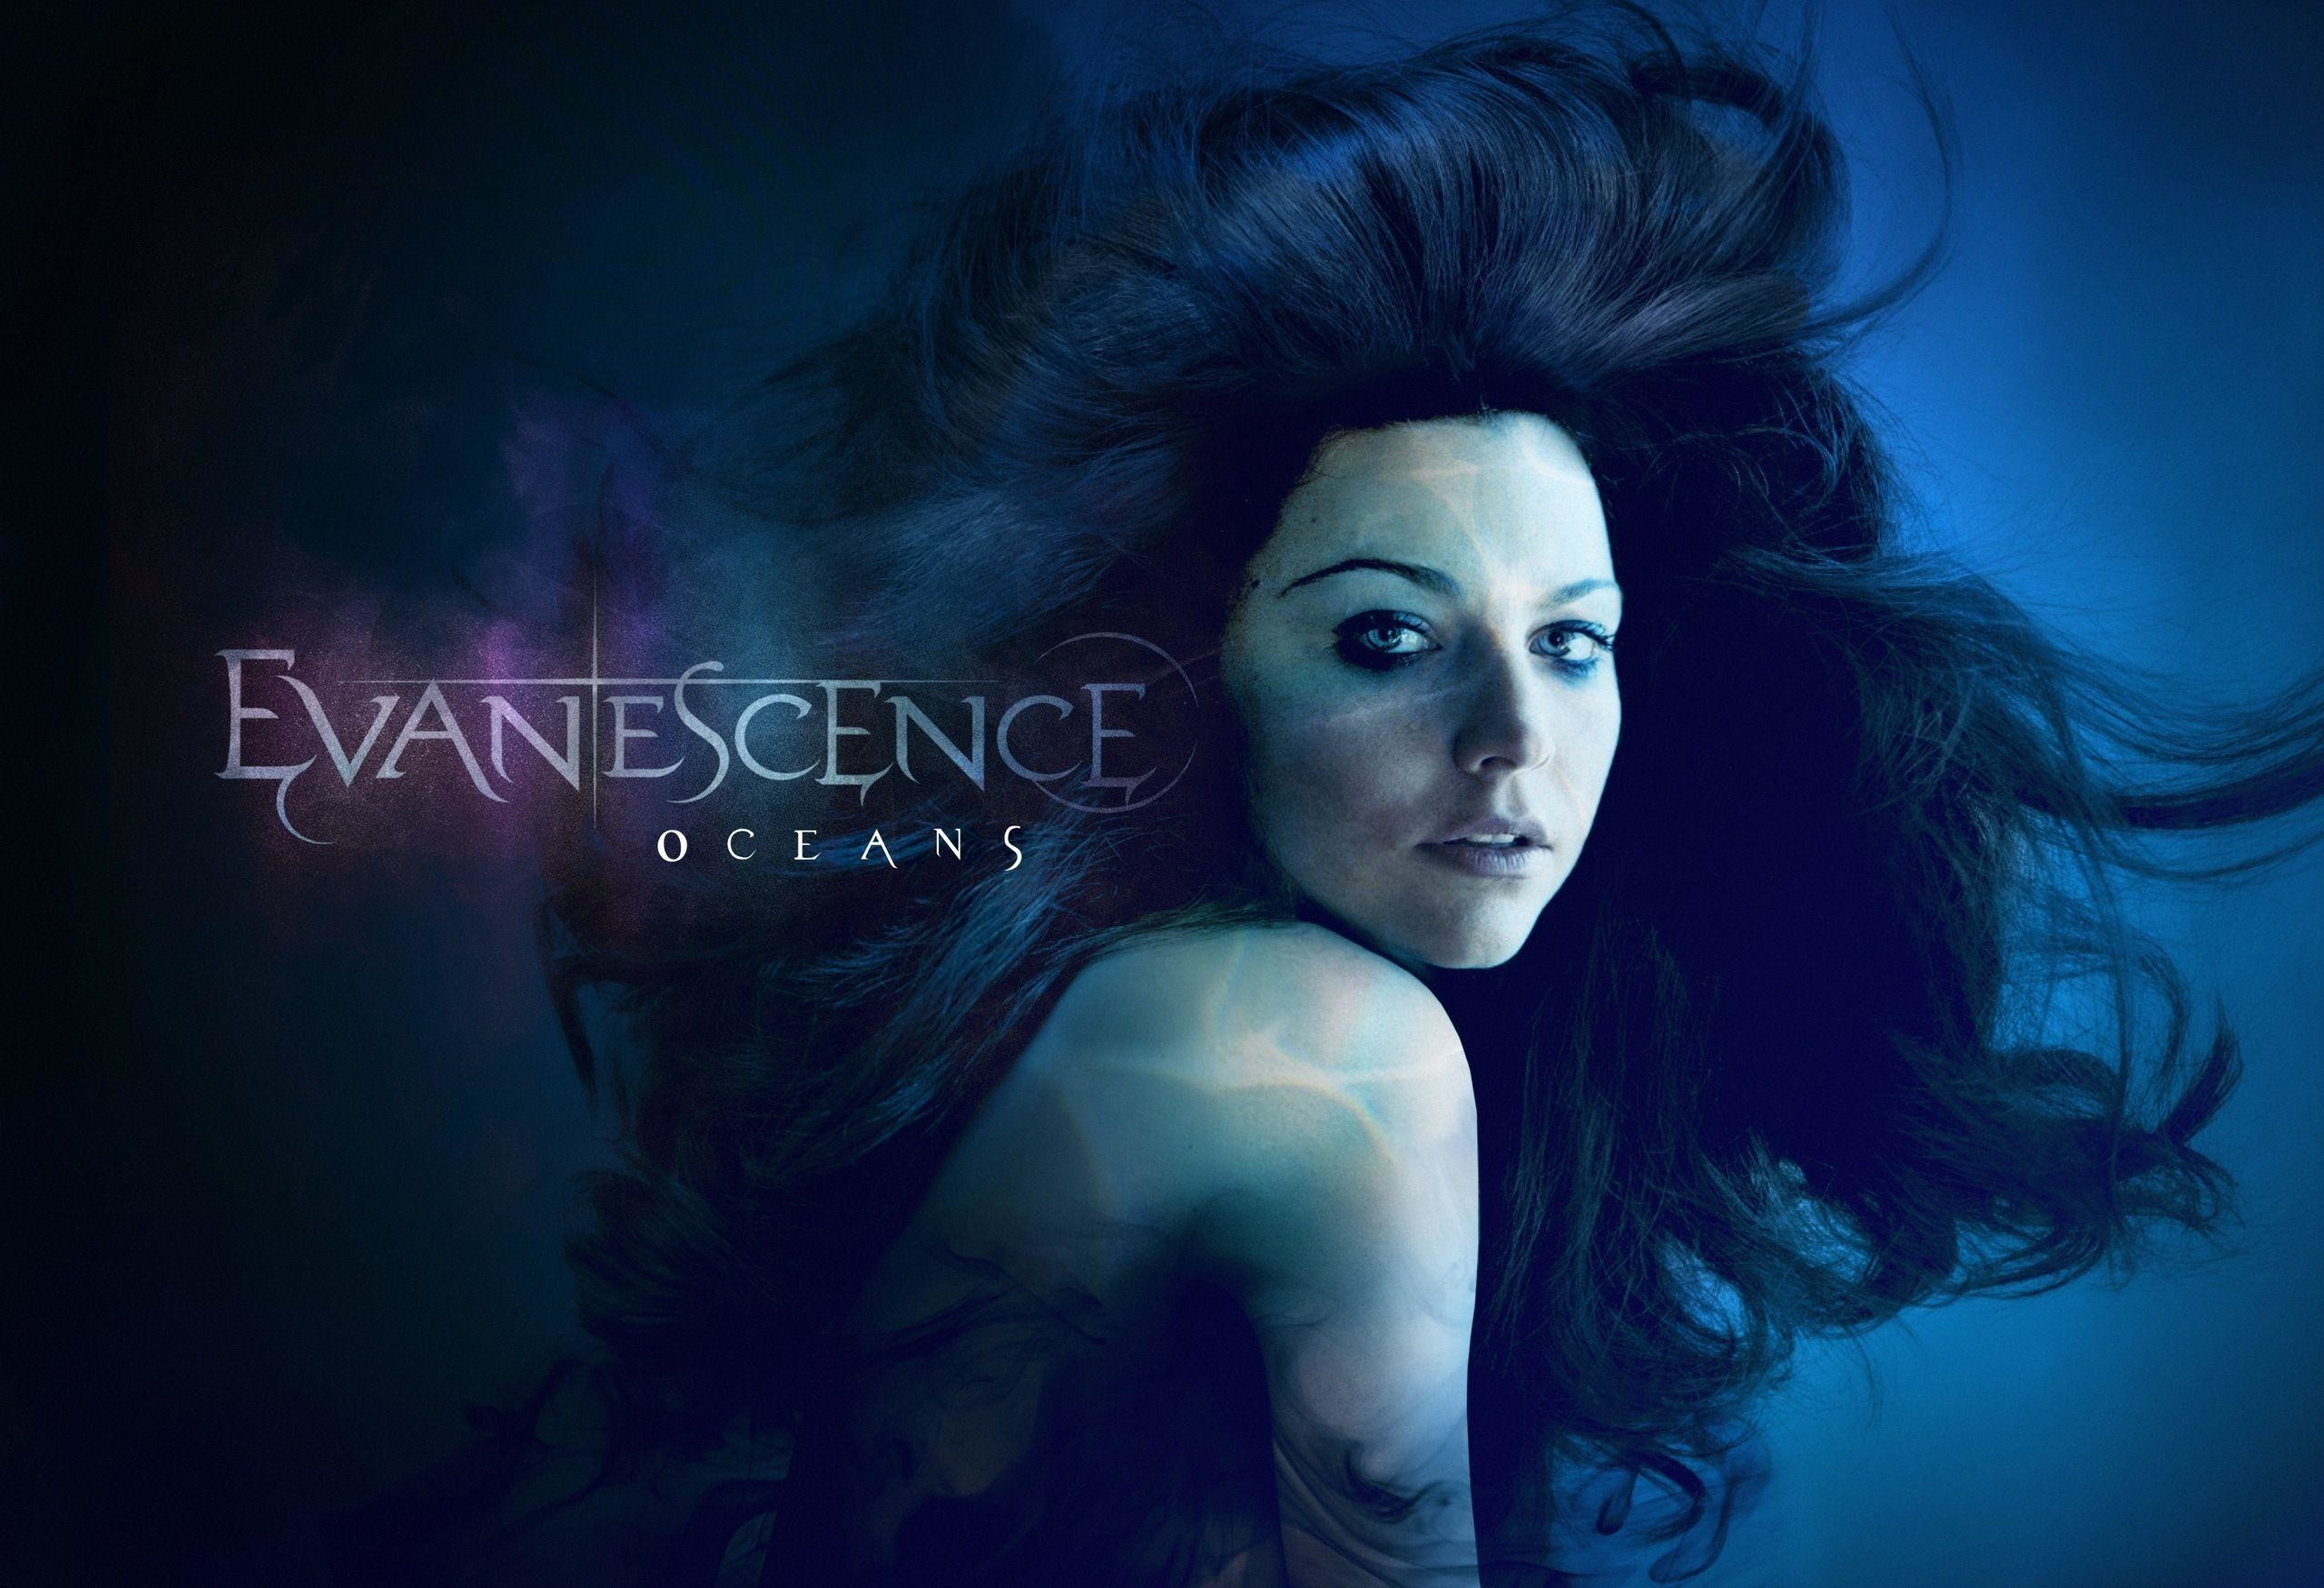 Amy Lee Evanescence Wallpaper, singer musician | Wallpaper